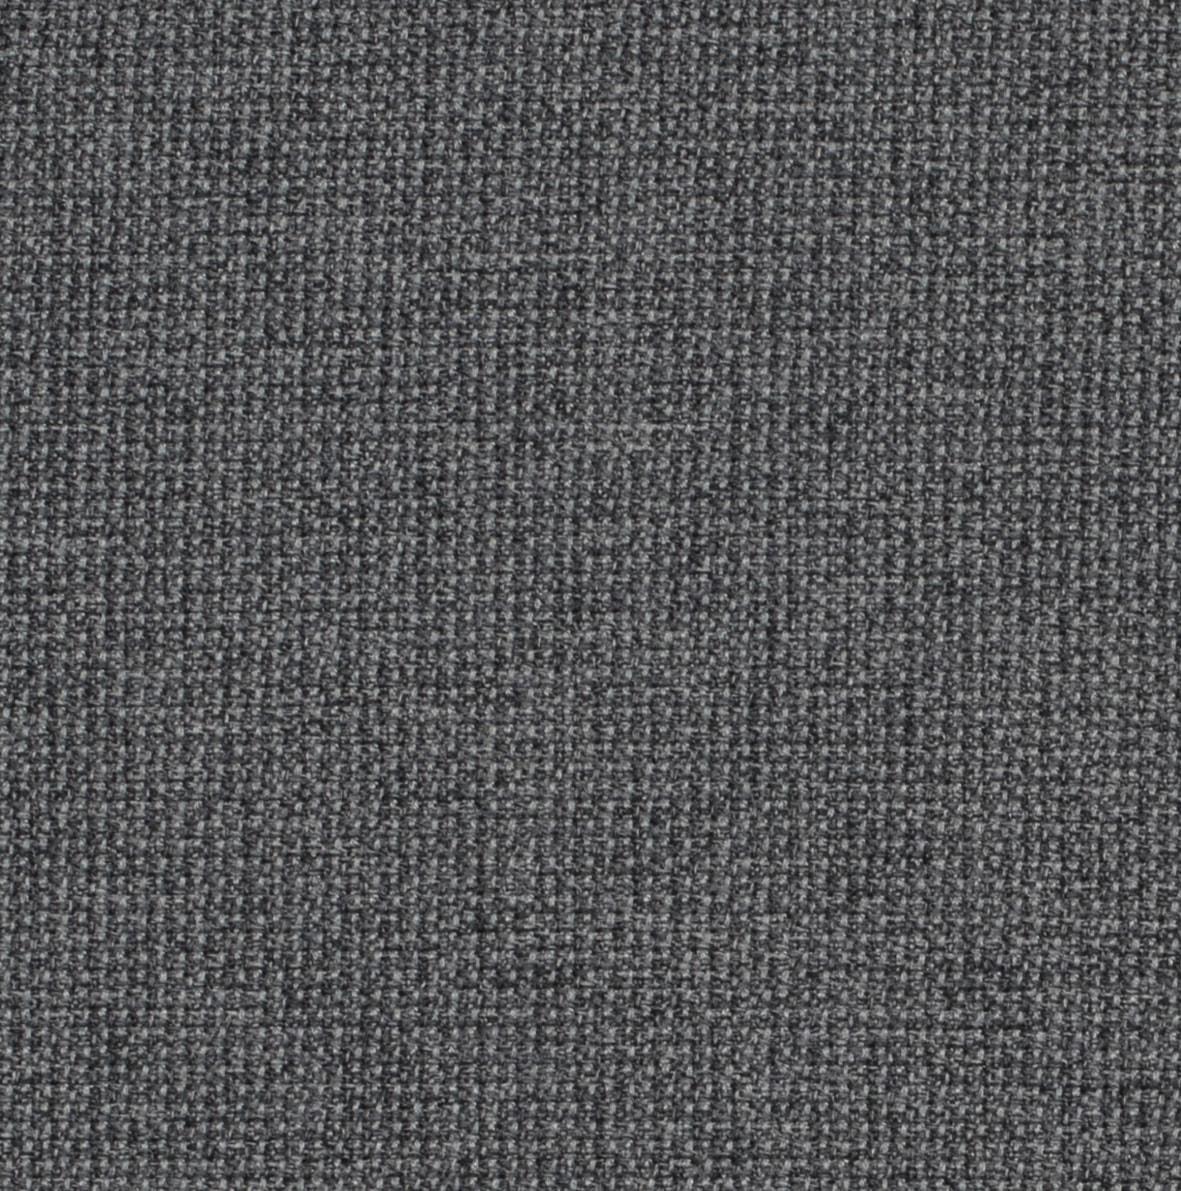 Twist Melange – 60011